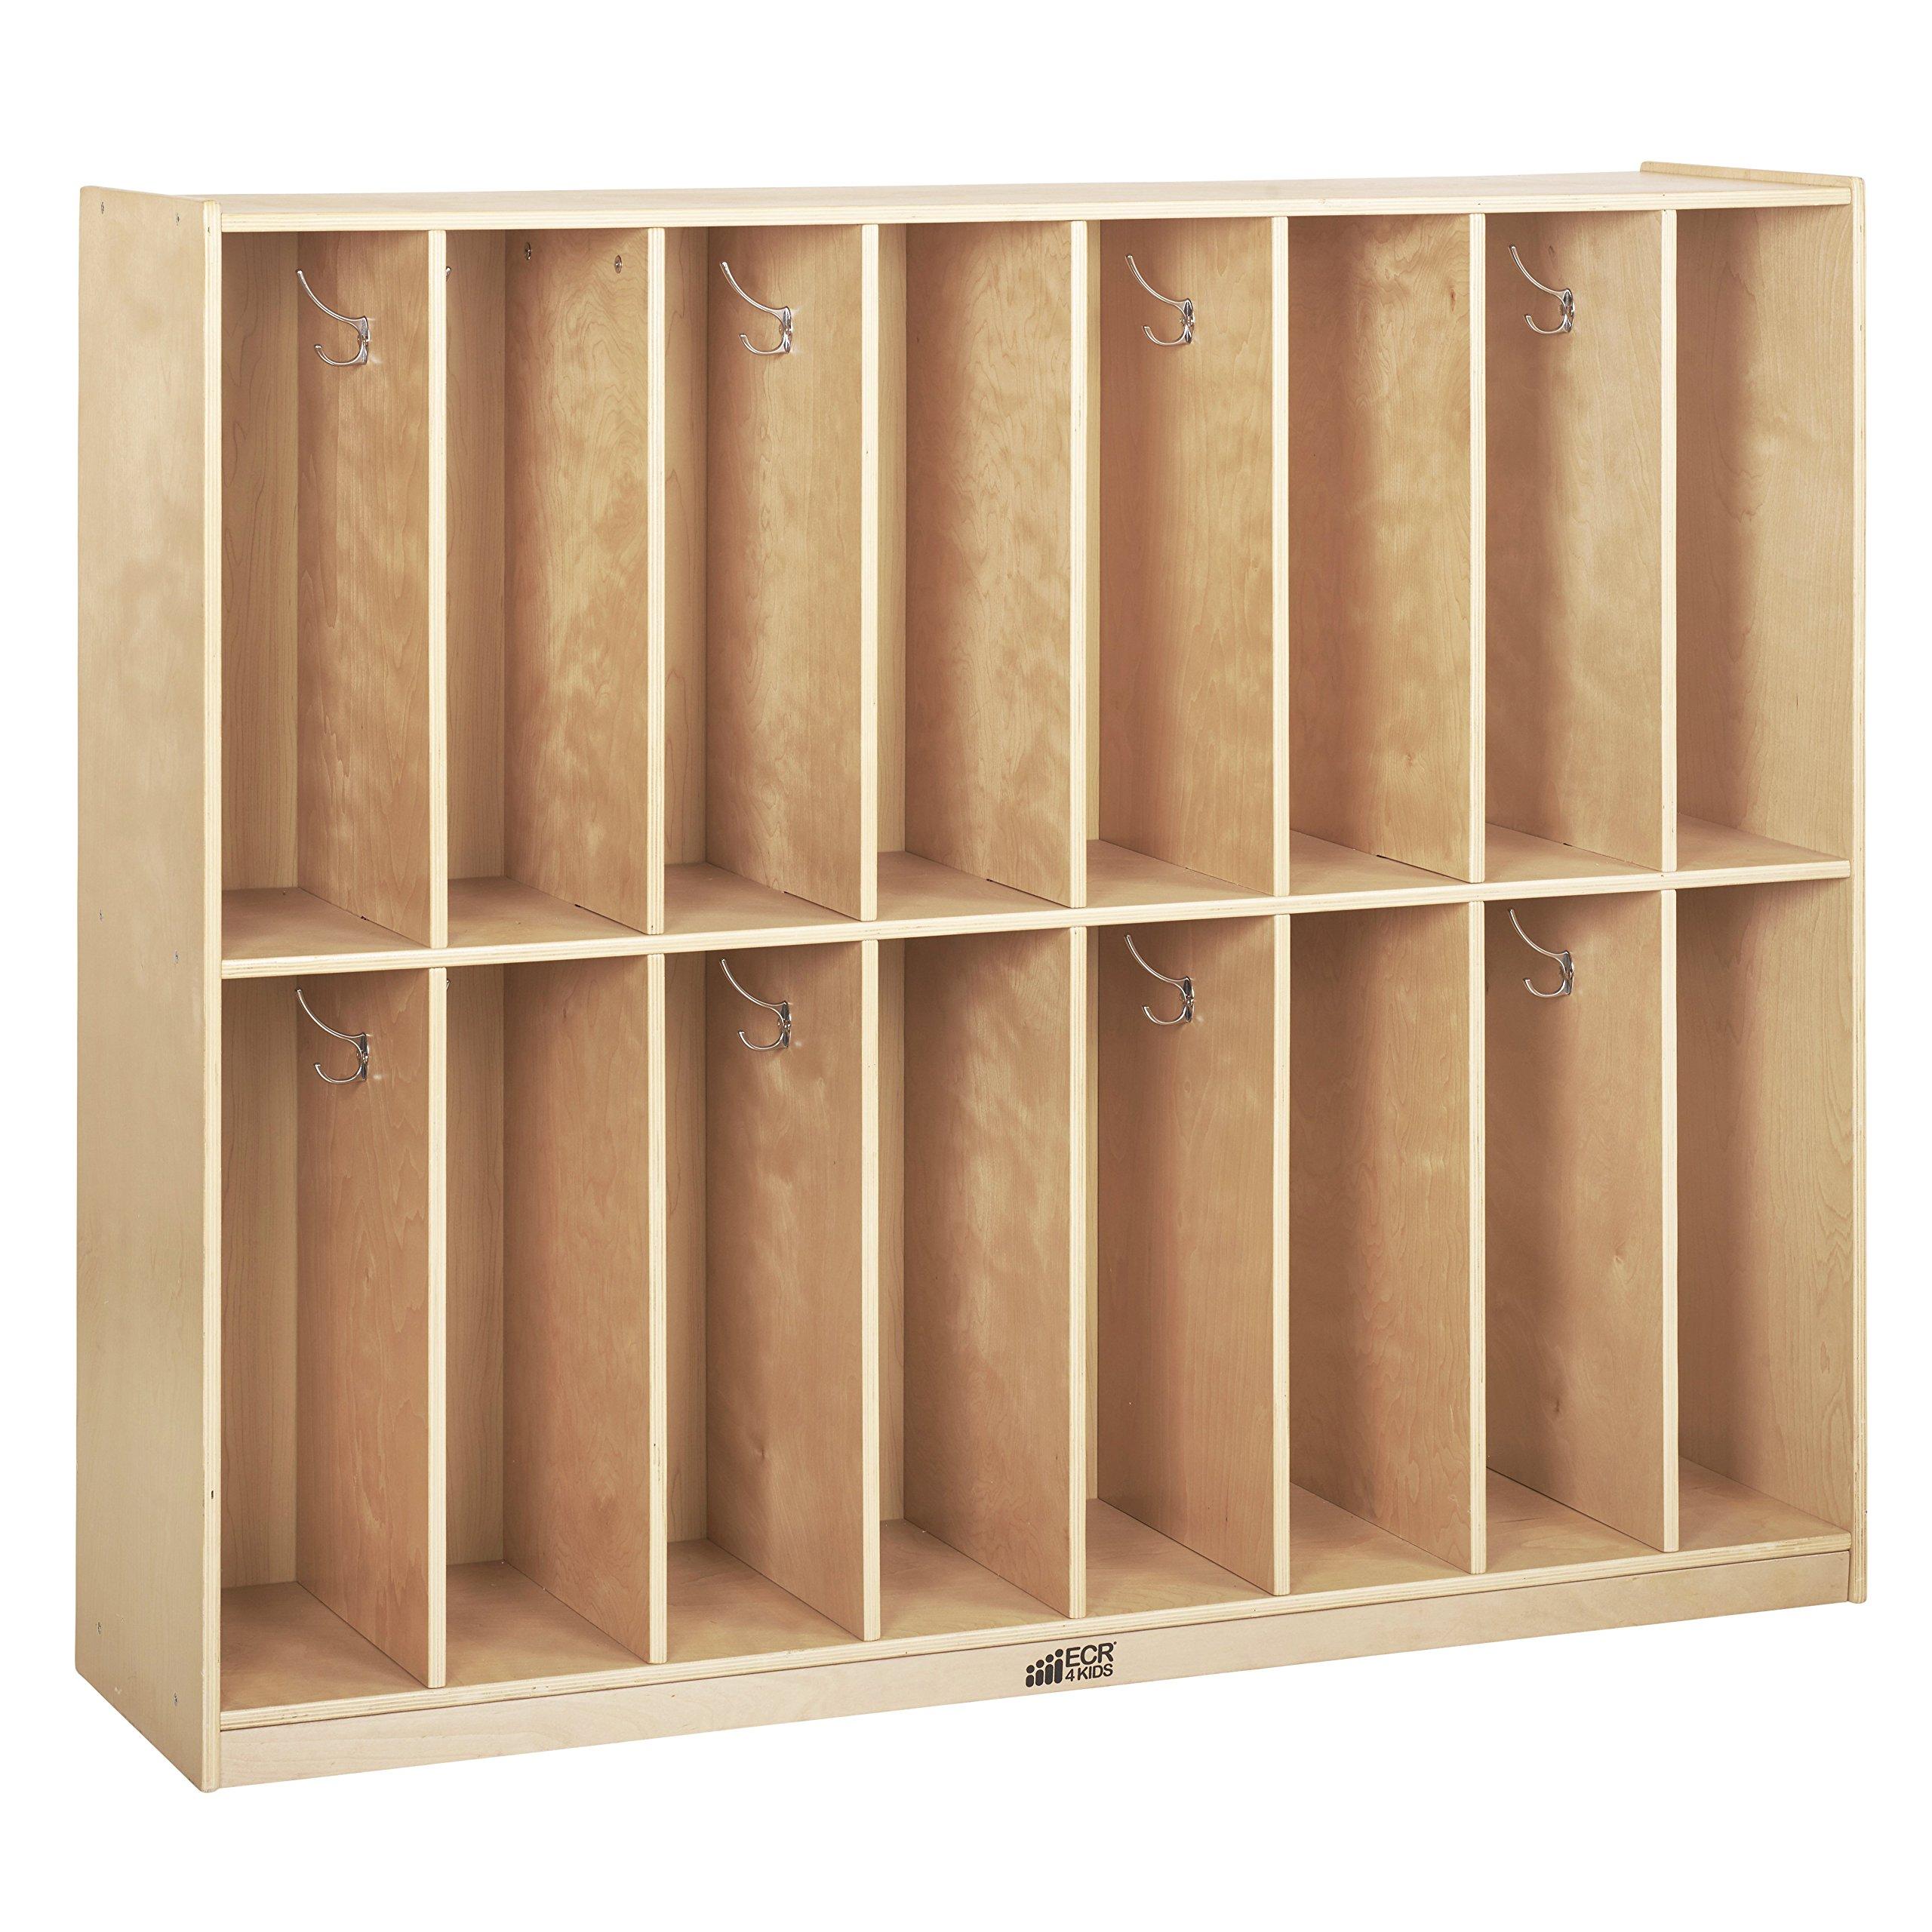 ECR4Kids Birch 16-Section Slim-Fit School Coat Locker with Hooks and Storage for Kids